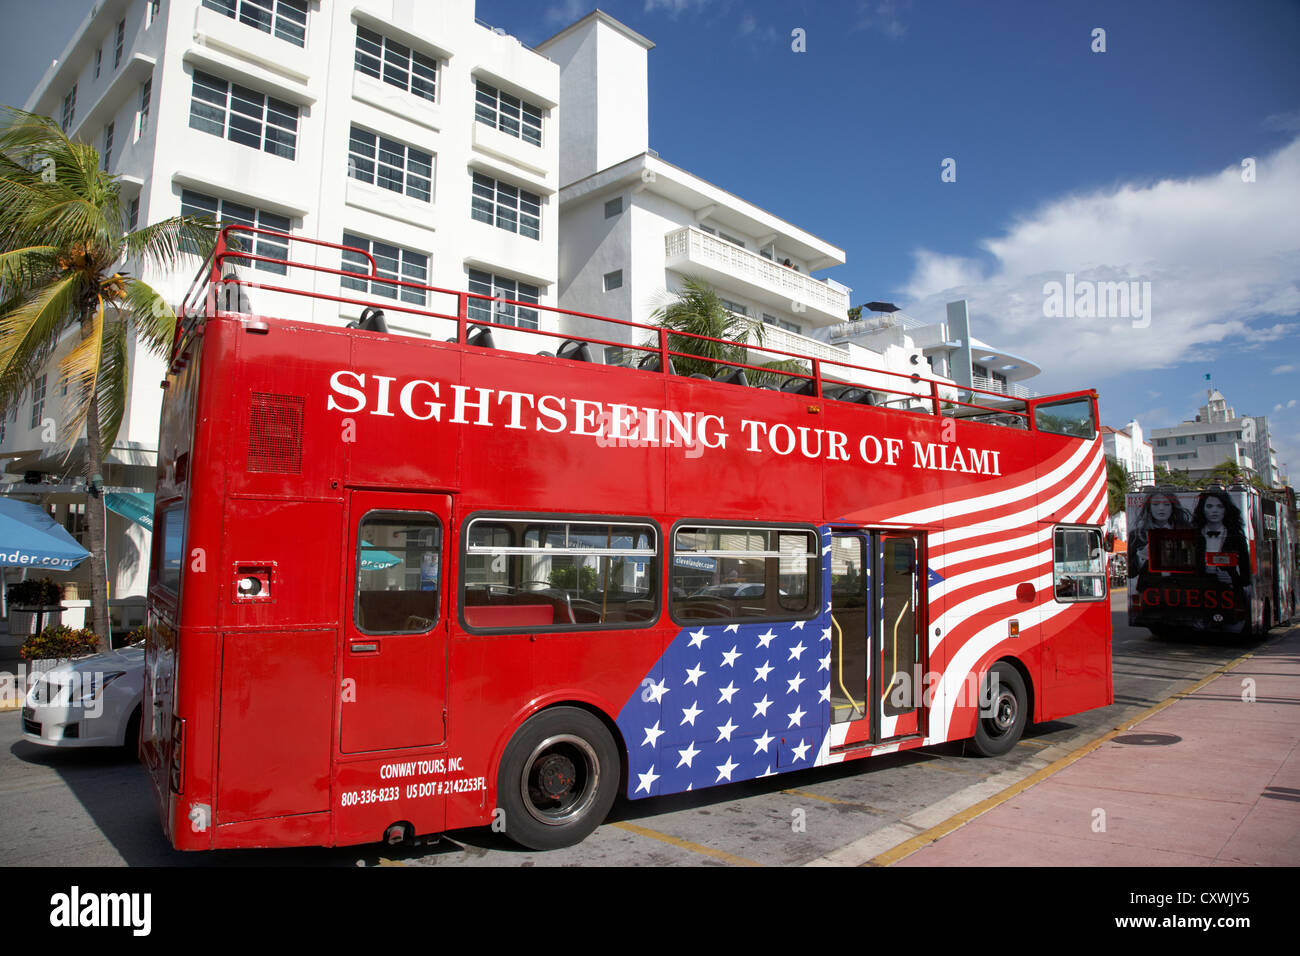 sightseeing tour red double deck bus miami south beach florida usa - Stock Image